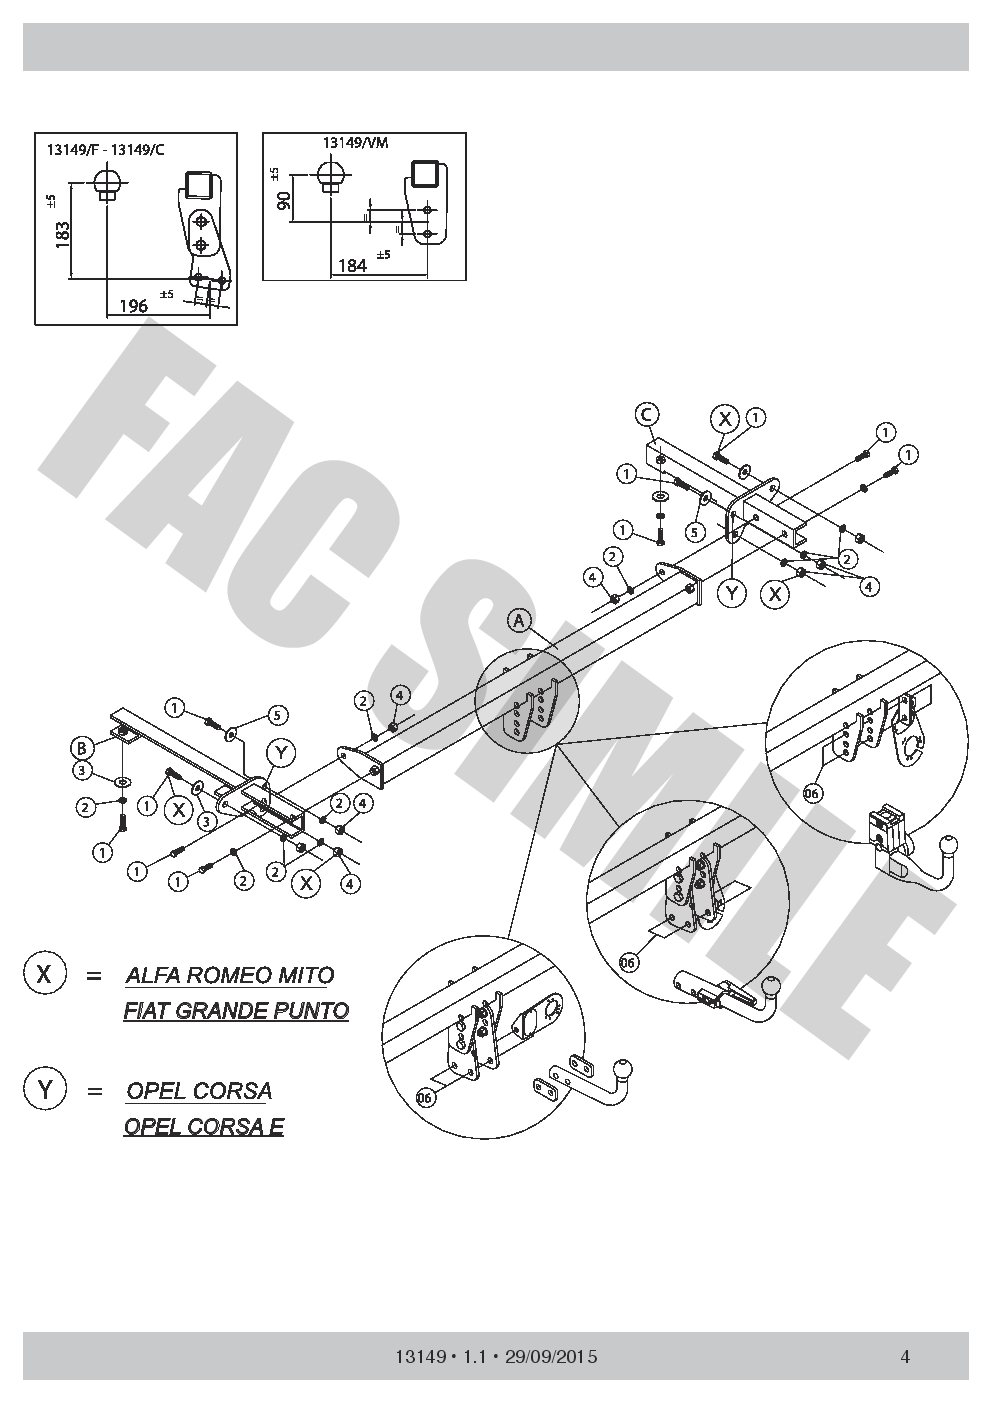 AHK Abnehmbare Anhängerkupplung 7p C2 E-Satz Opel Vauxhall Corsa E 13149//C/_E9